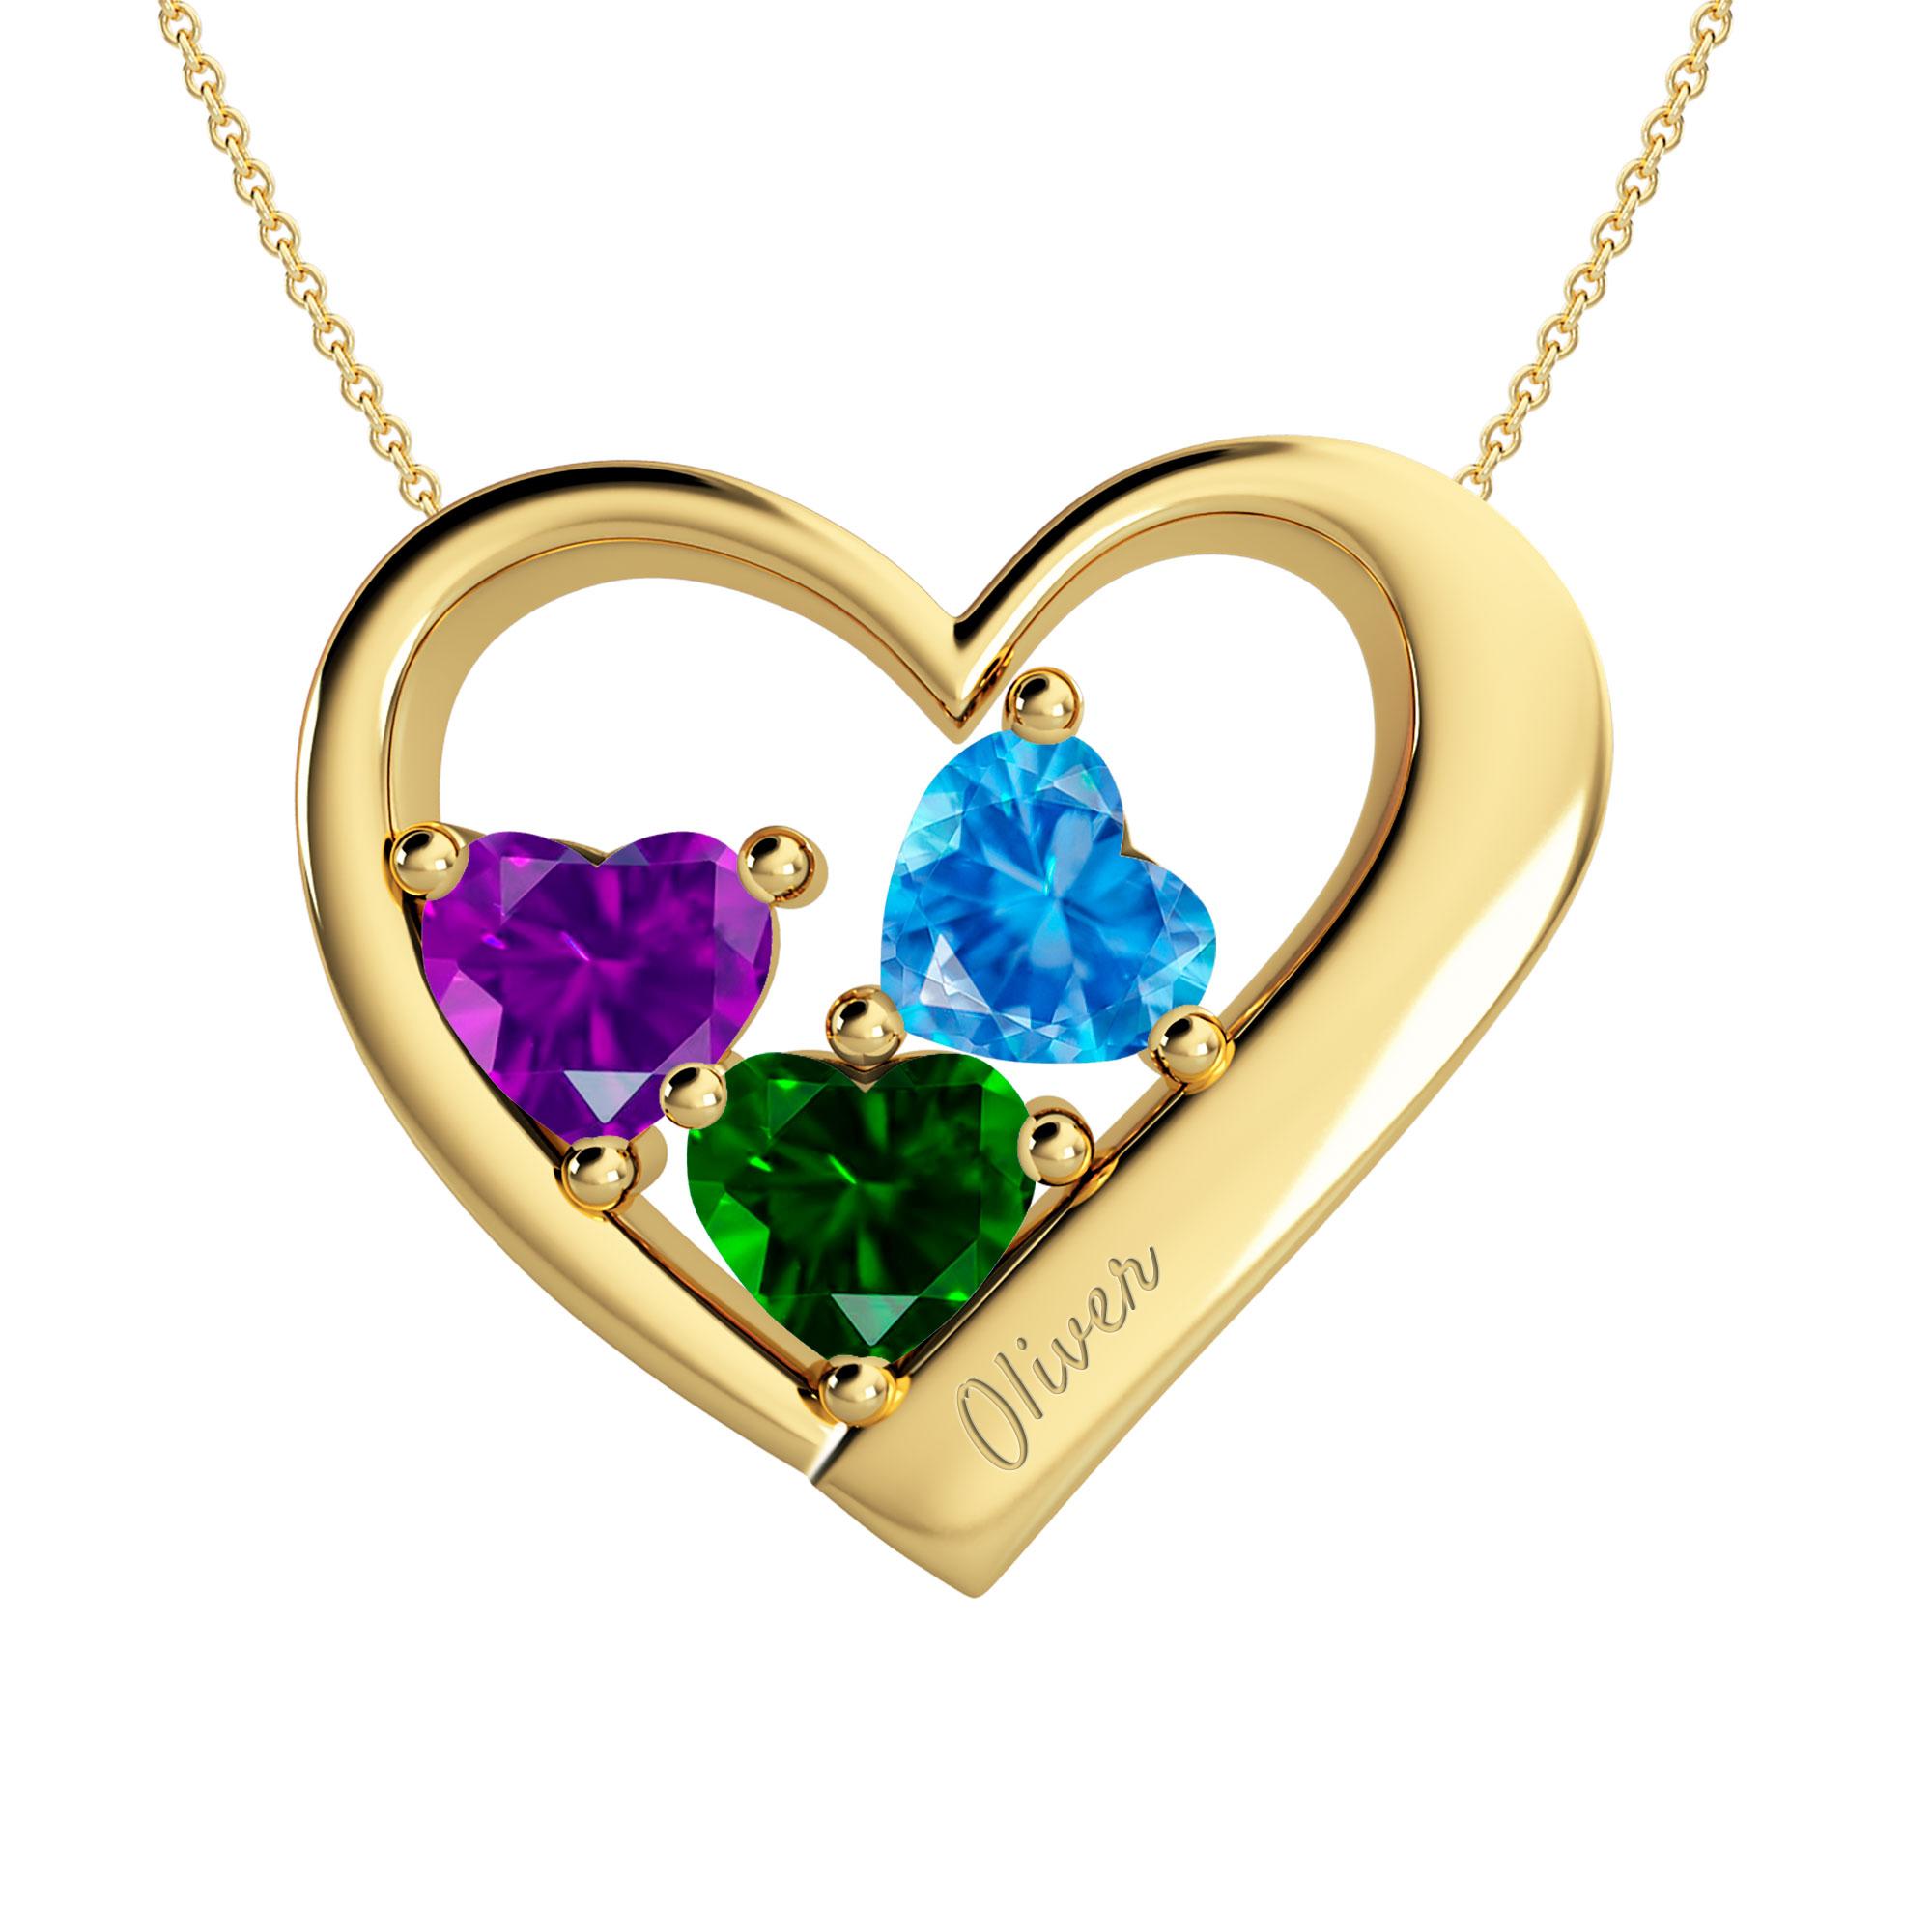 Mother's Heart Custom Birthstone Engravable Family Necklace (2-3 Gemstones)